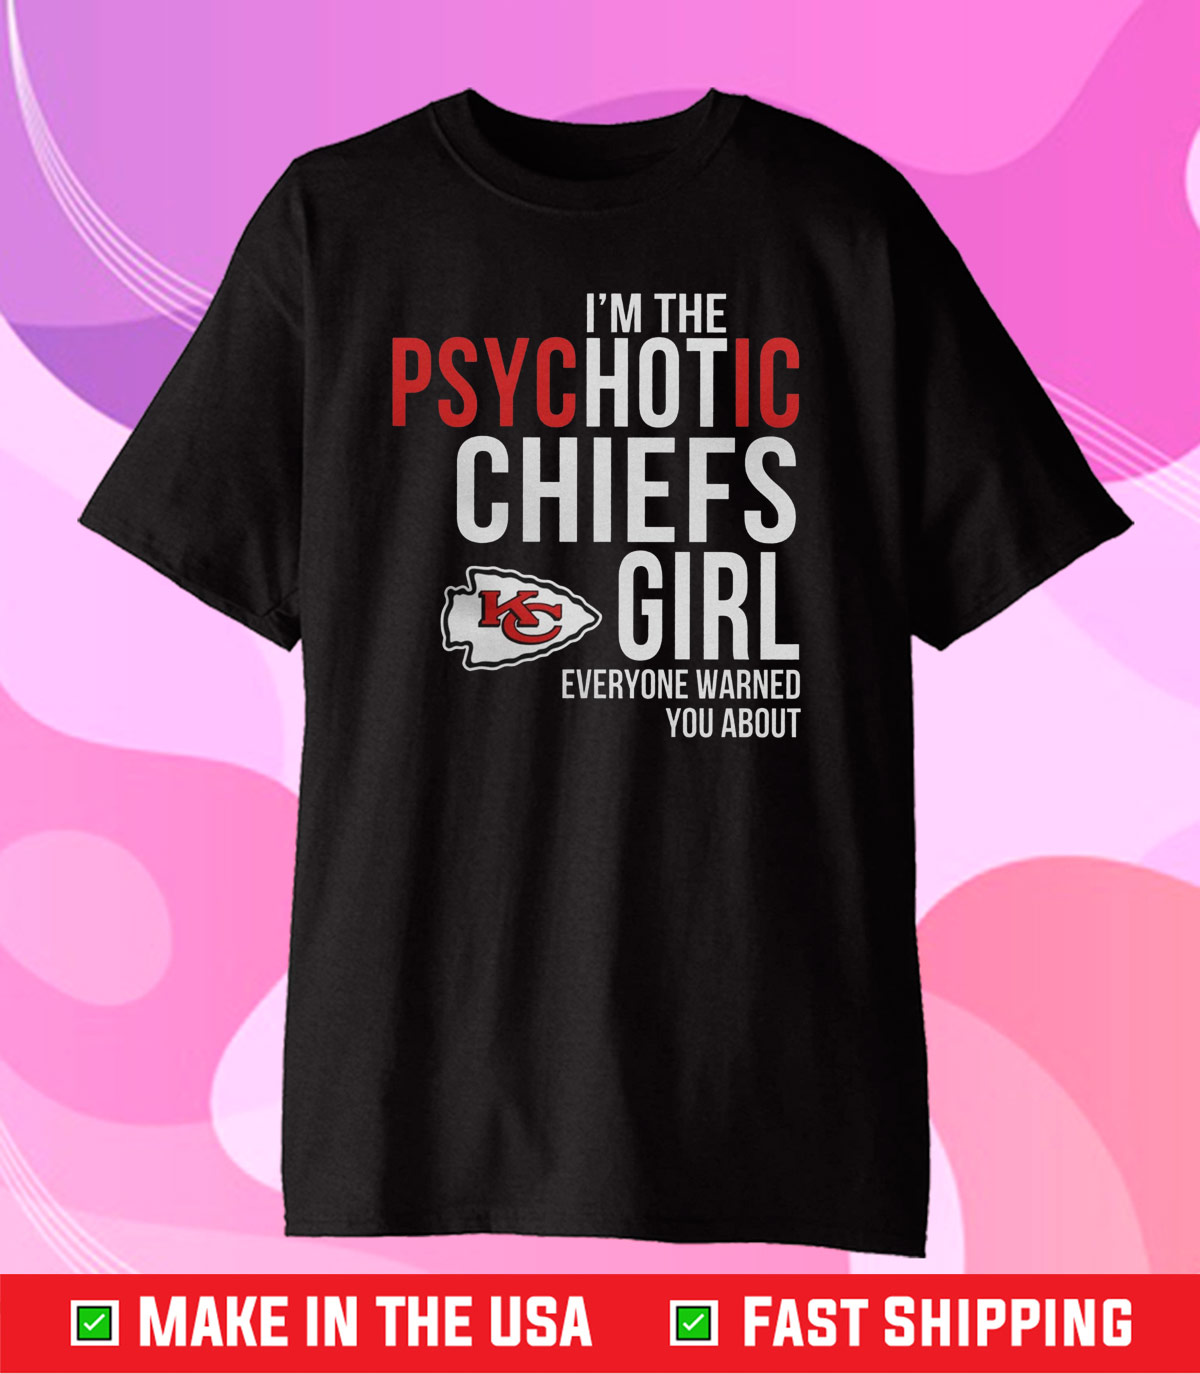 Kansas City Chiefs NFL Champions Unisex T-Shirt